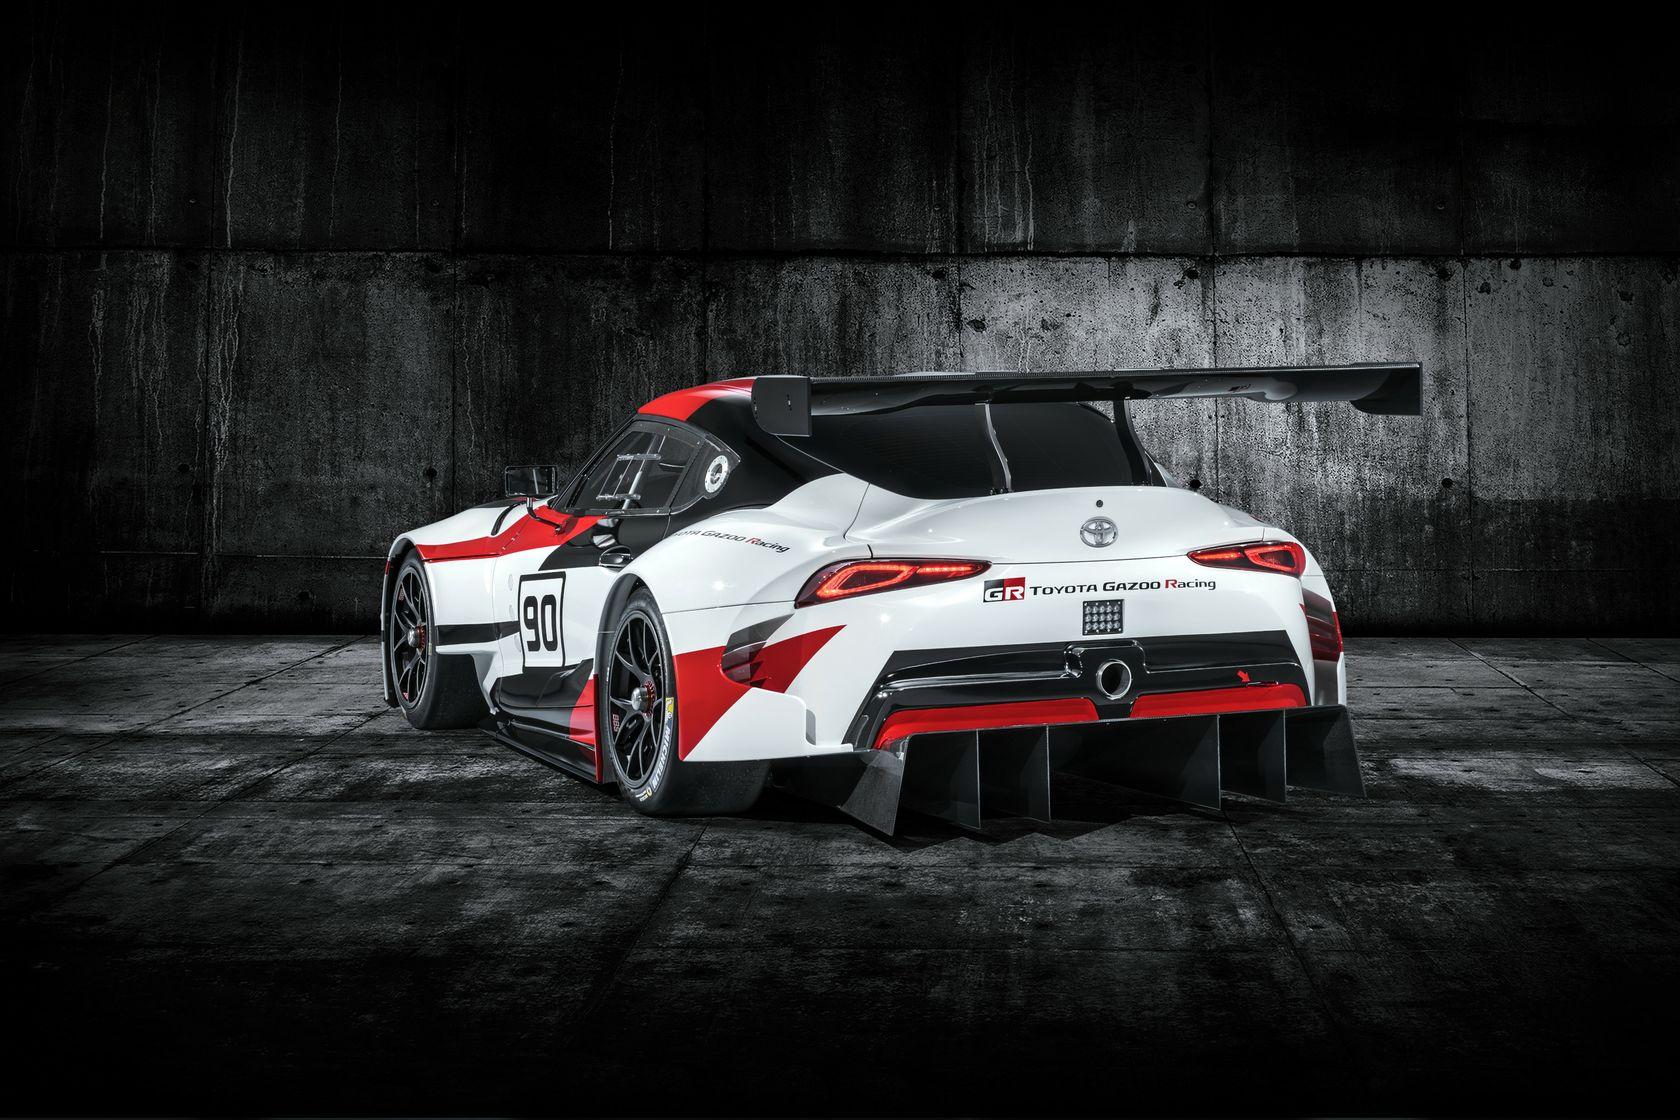 GR Supra Racing Concept - Studio - 03